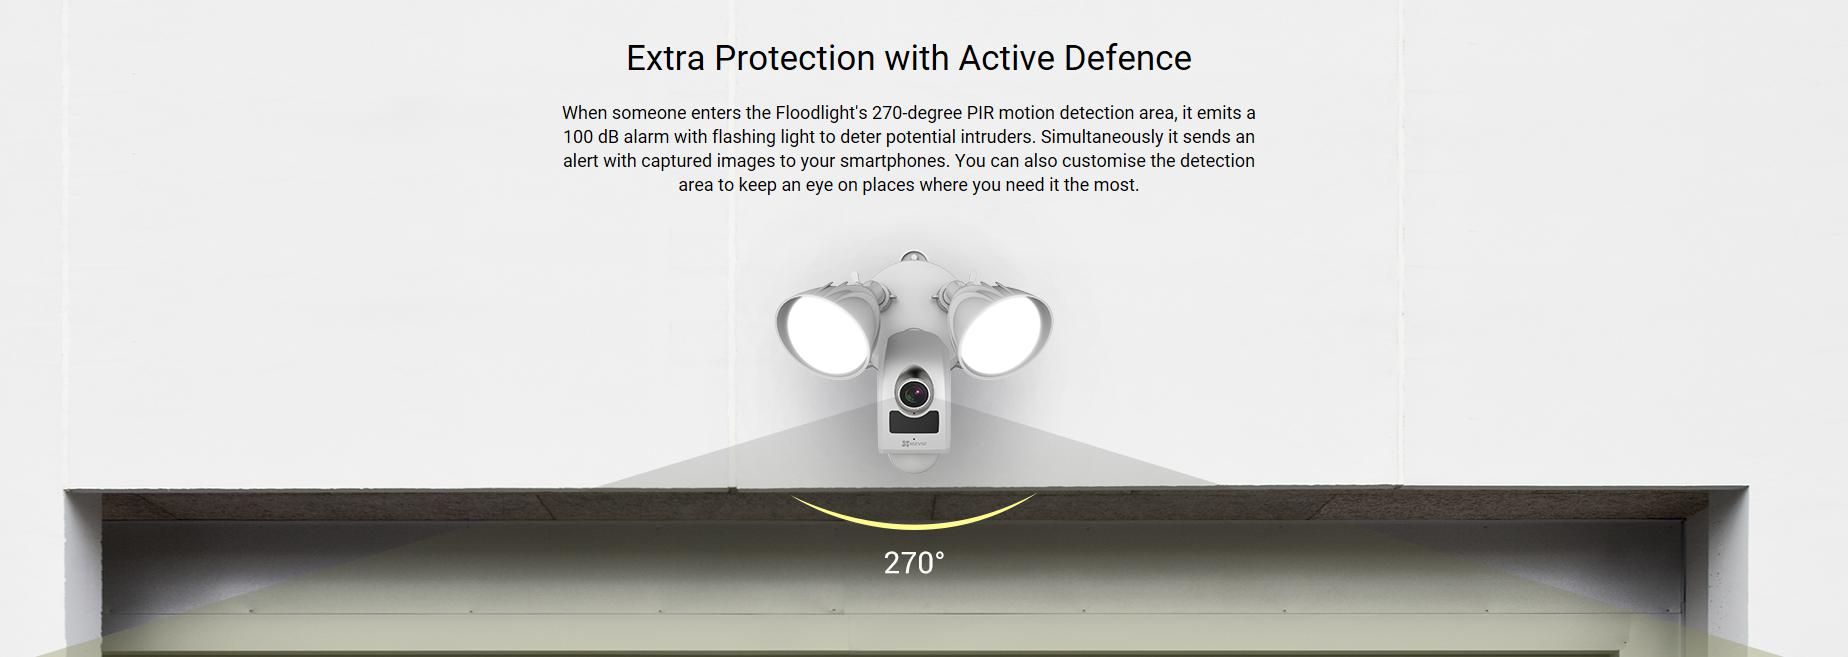 Ezviz Lc1 1080p Floodlight Camera With Built In Alarm System